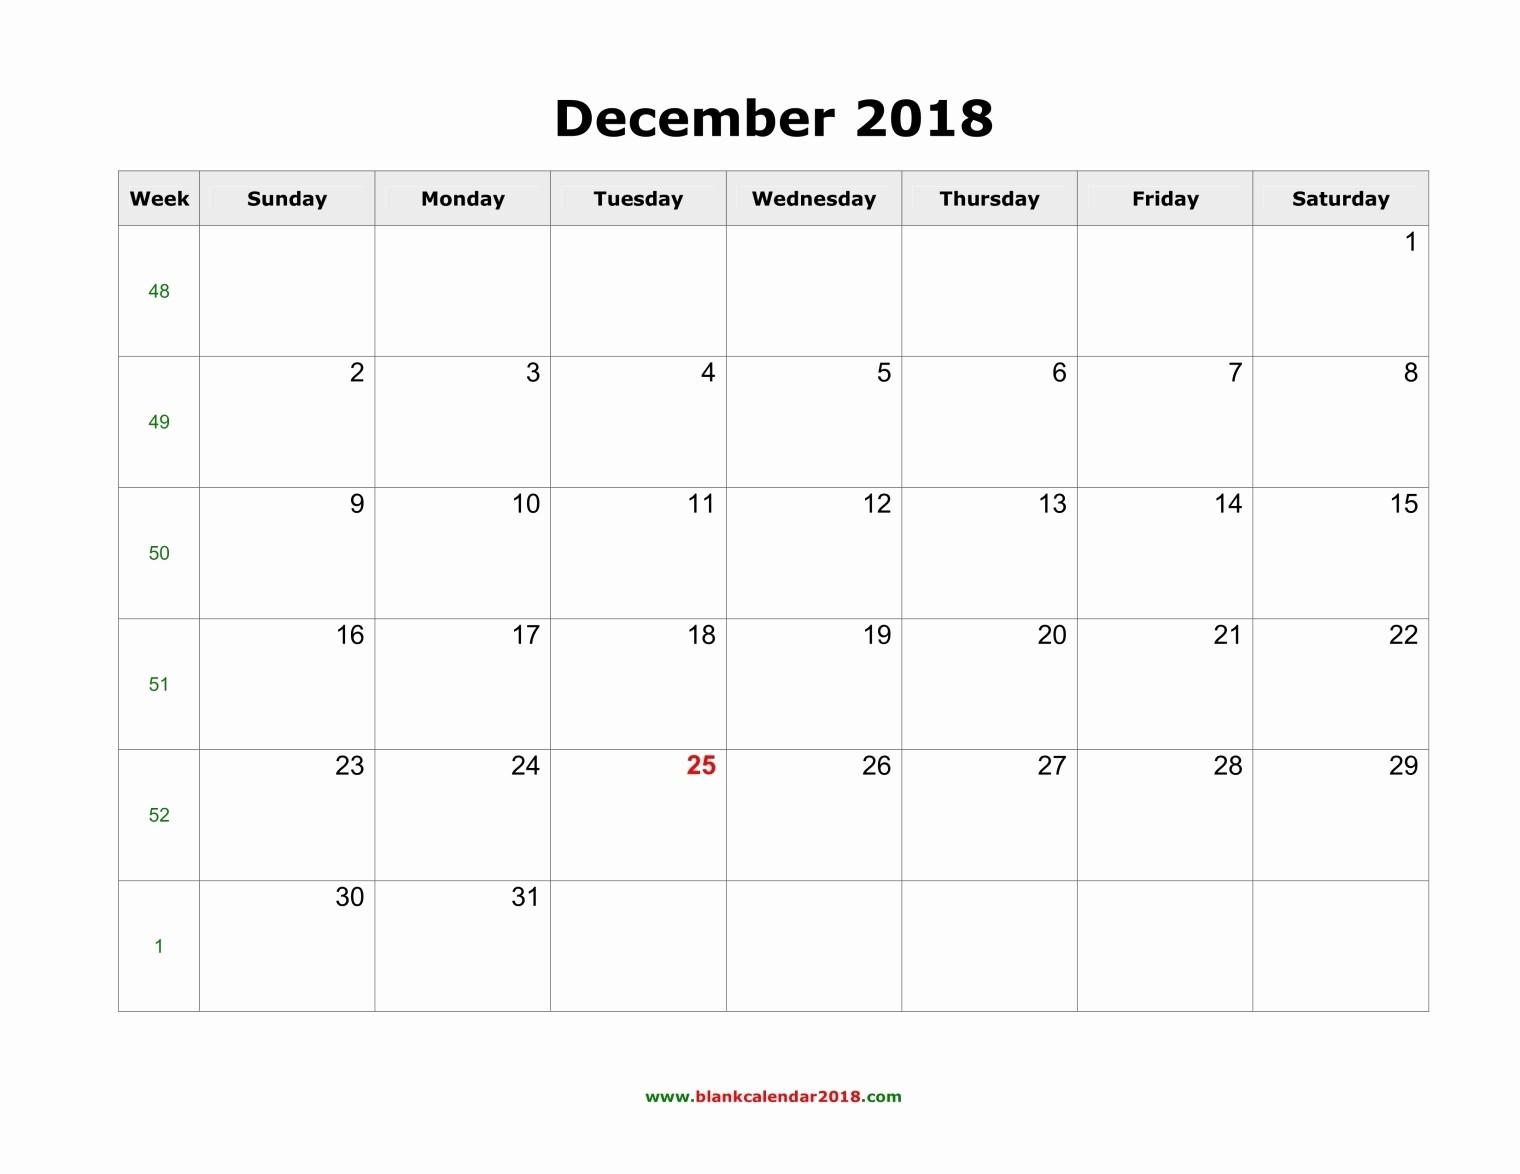 Blank Calendar Template December 2018 Luxury Blank Calendar for December 2018